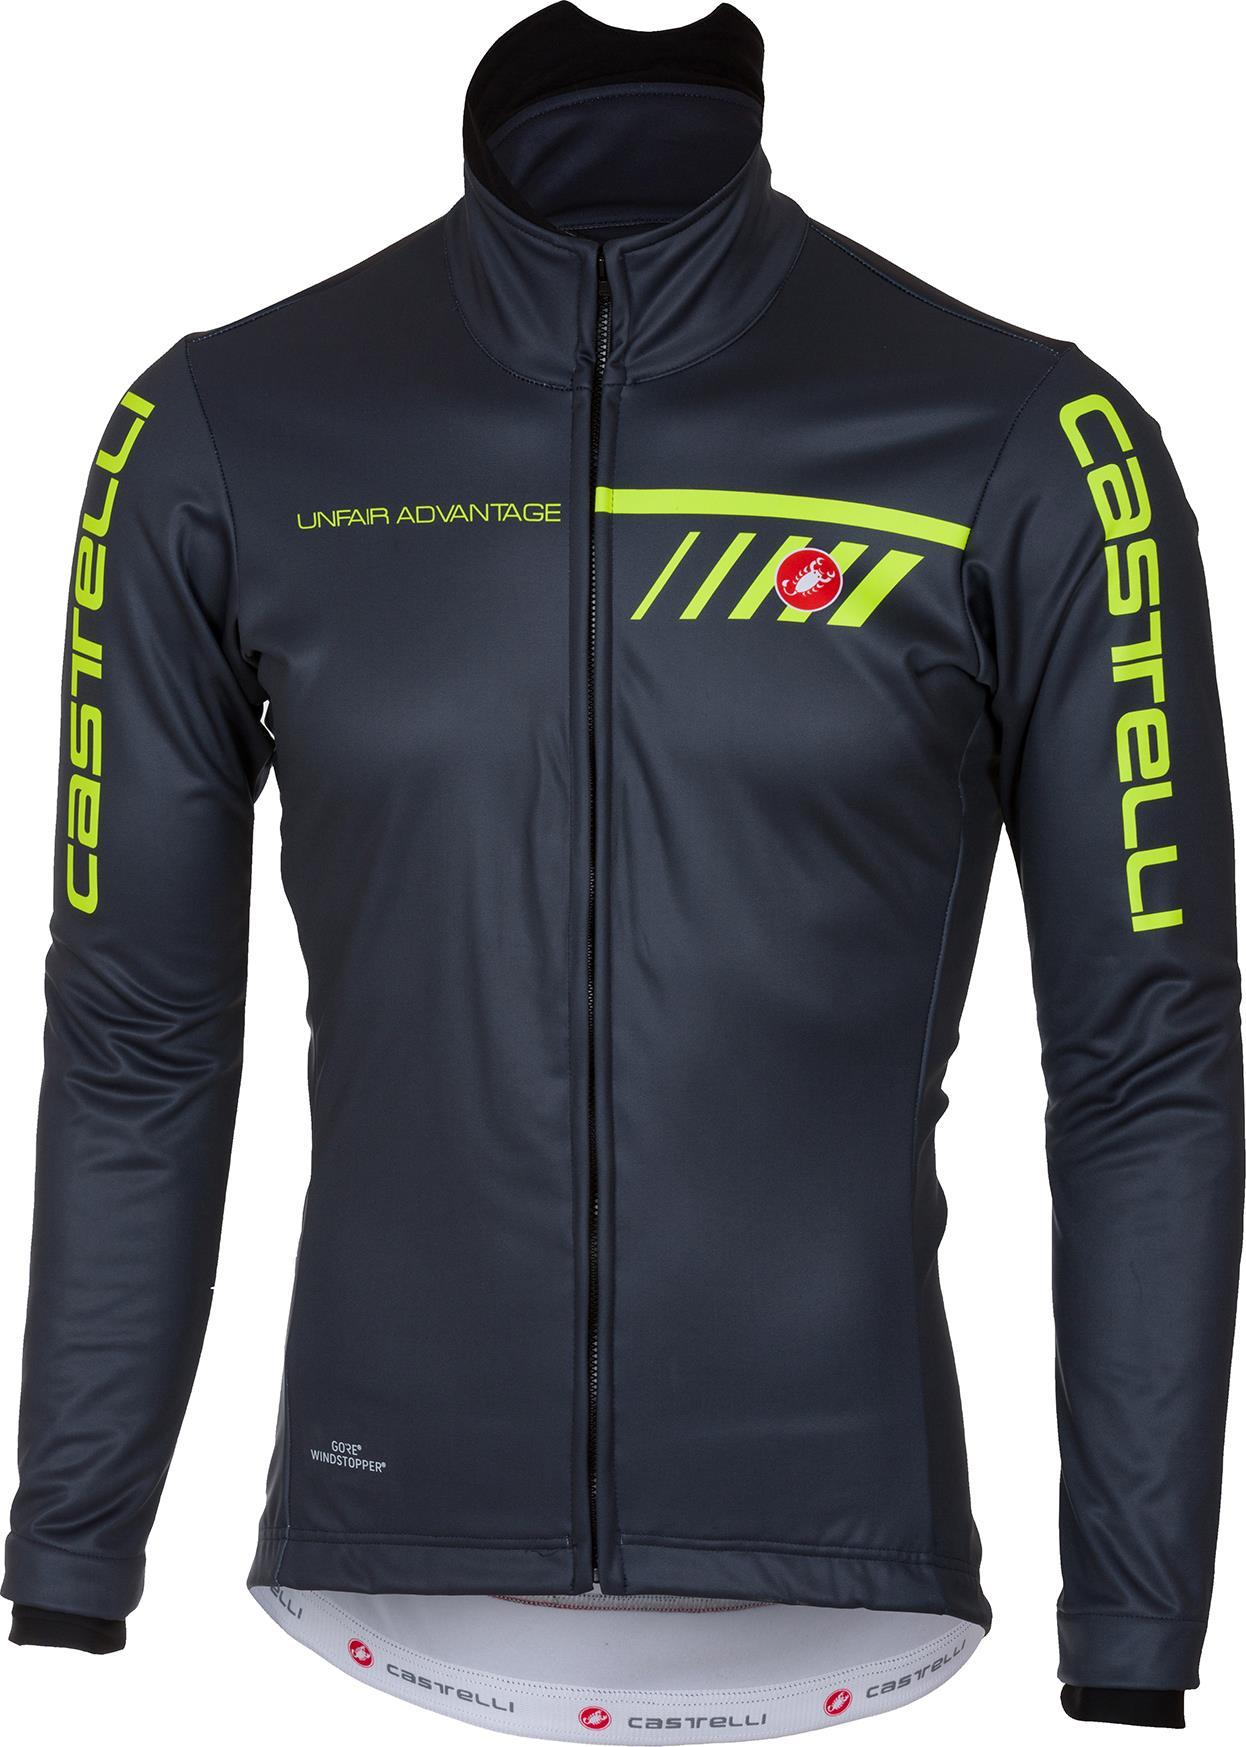 Castelli Velocissimo 2 Cycling Jacket - AW17